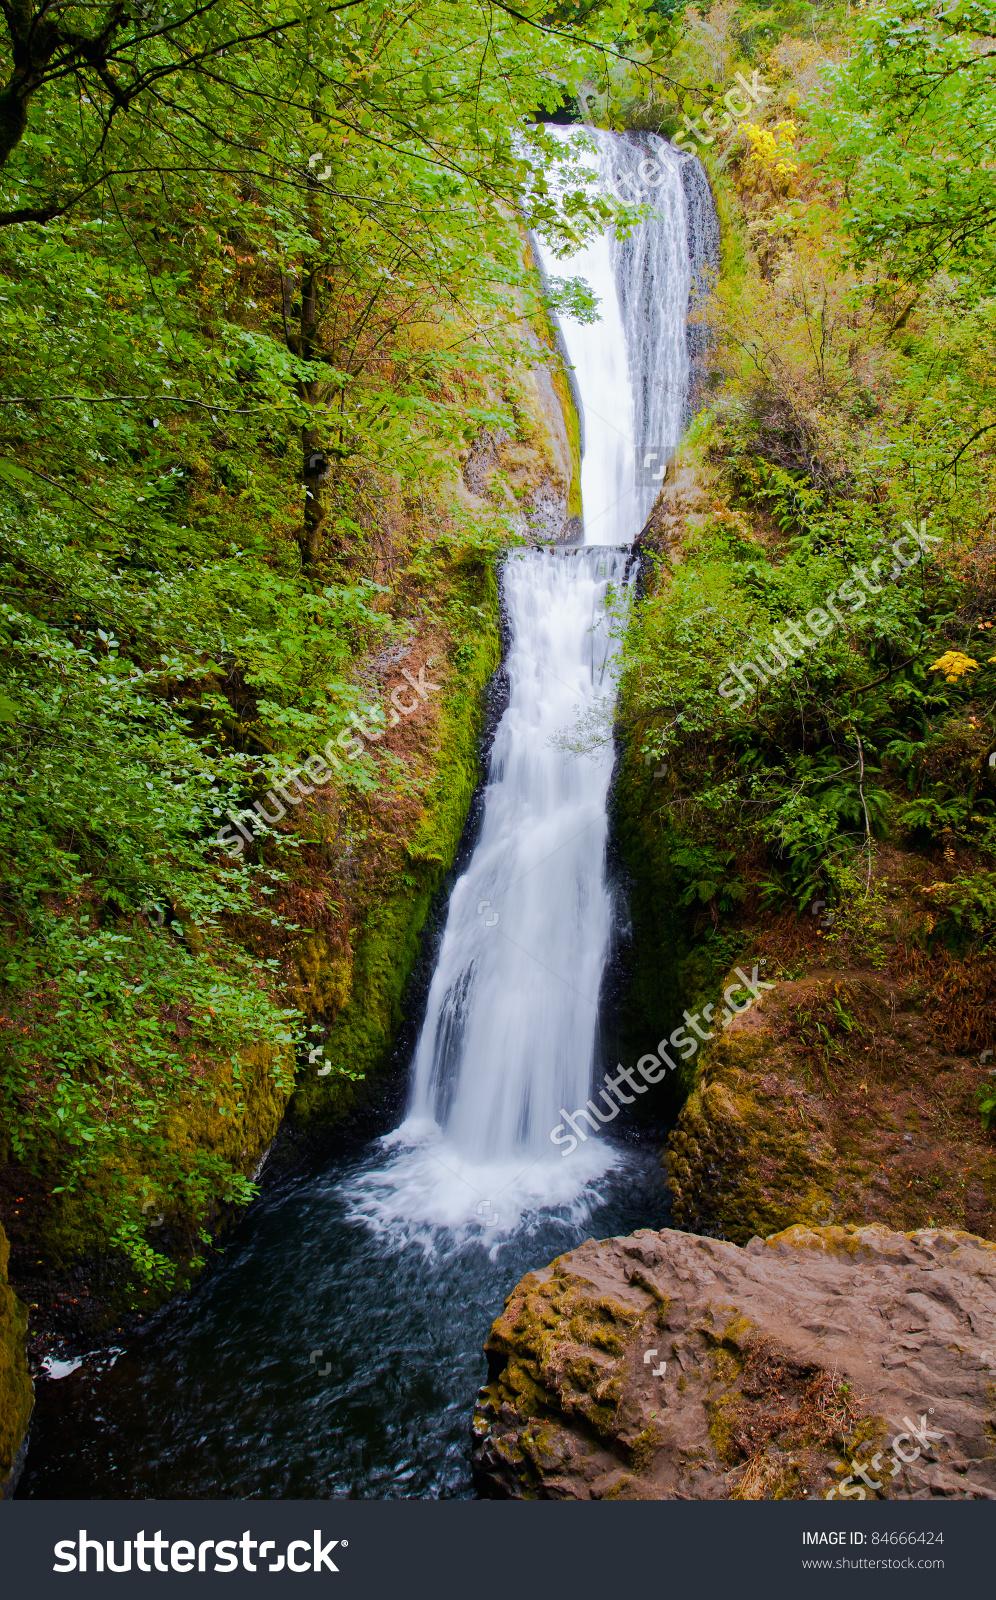 Bridal Veil Falls Columbia River Gorge Stock Photo 84666424.